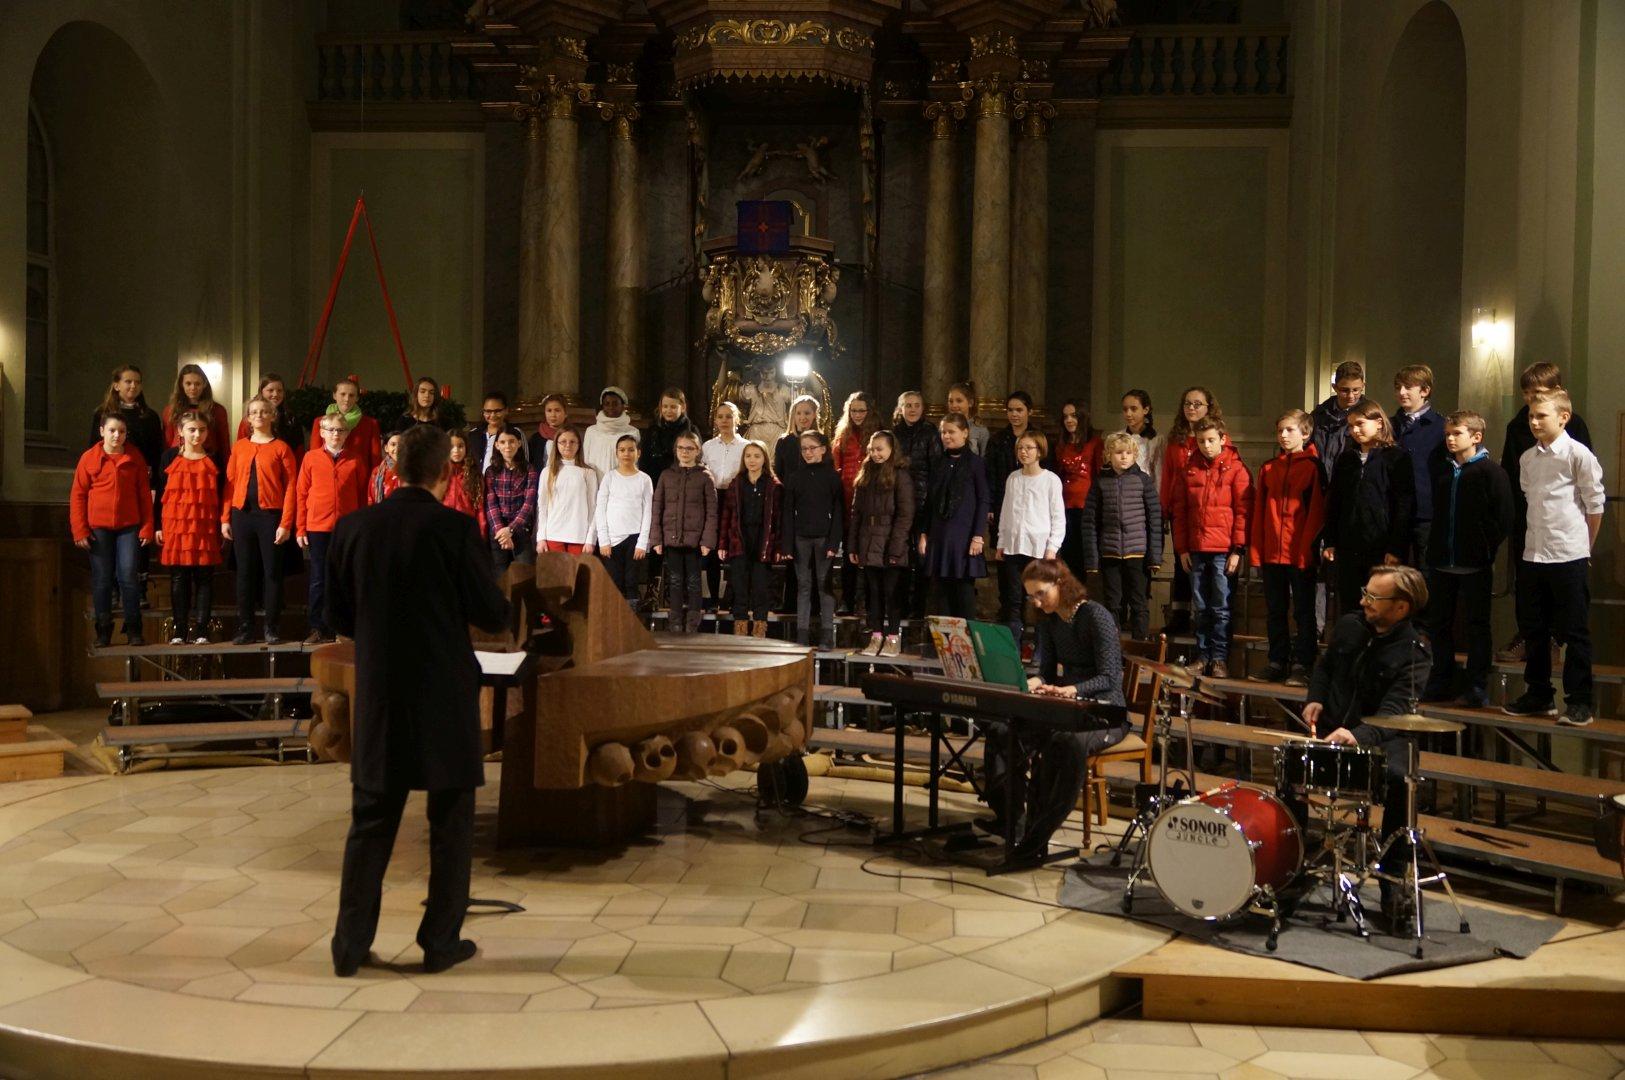 Adventskonzert (Ensembles der 5. - 8. Klassen - Dezember 2015)